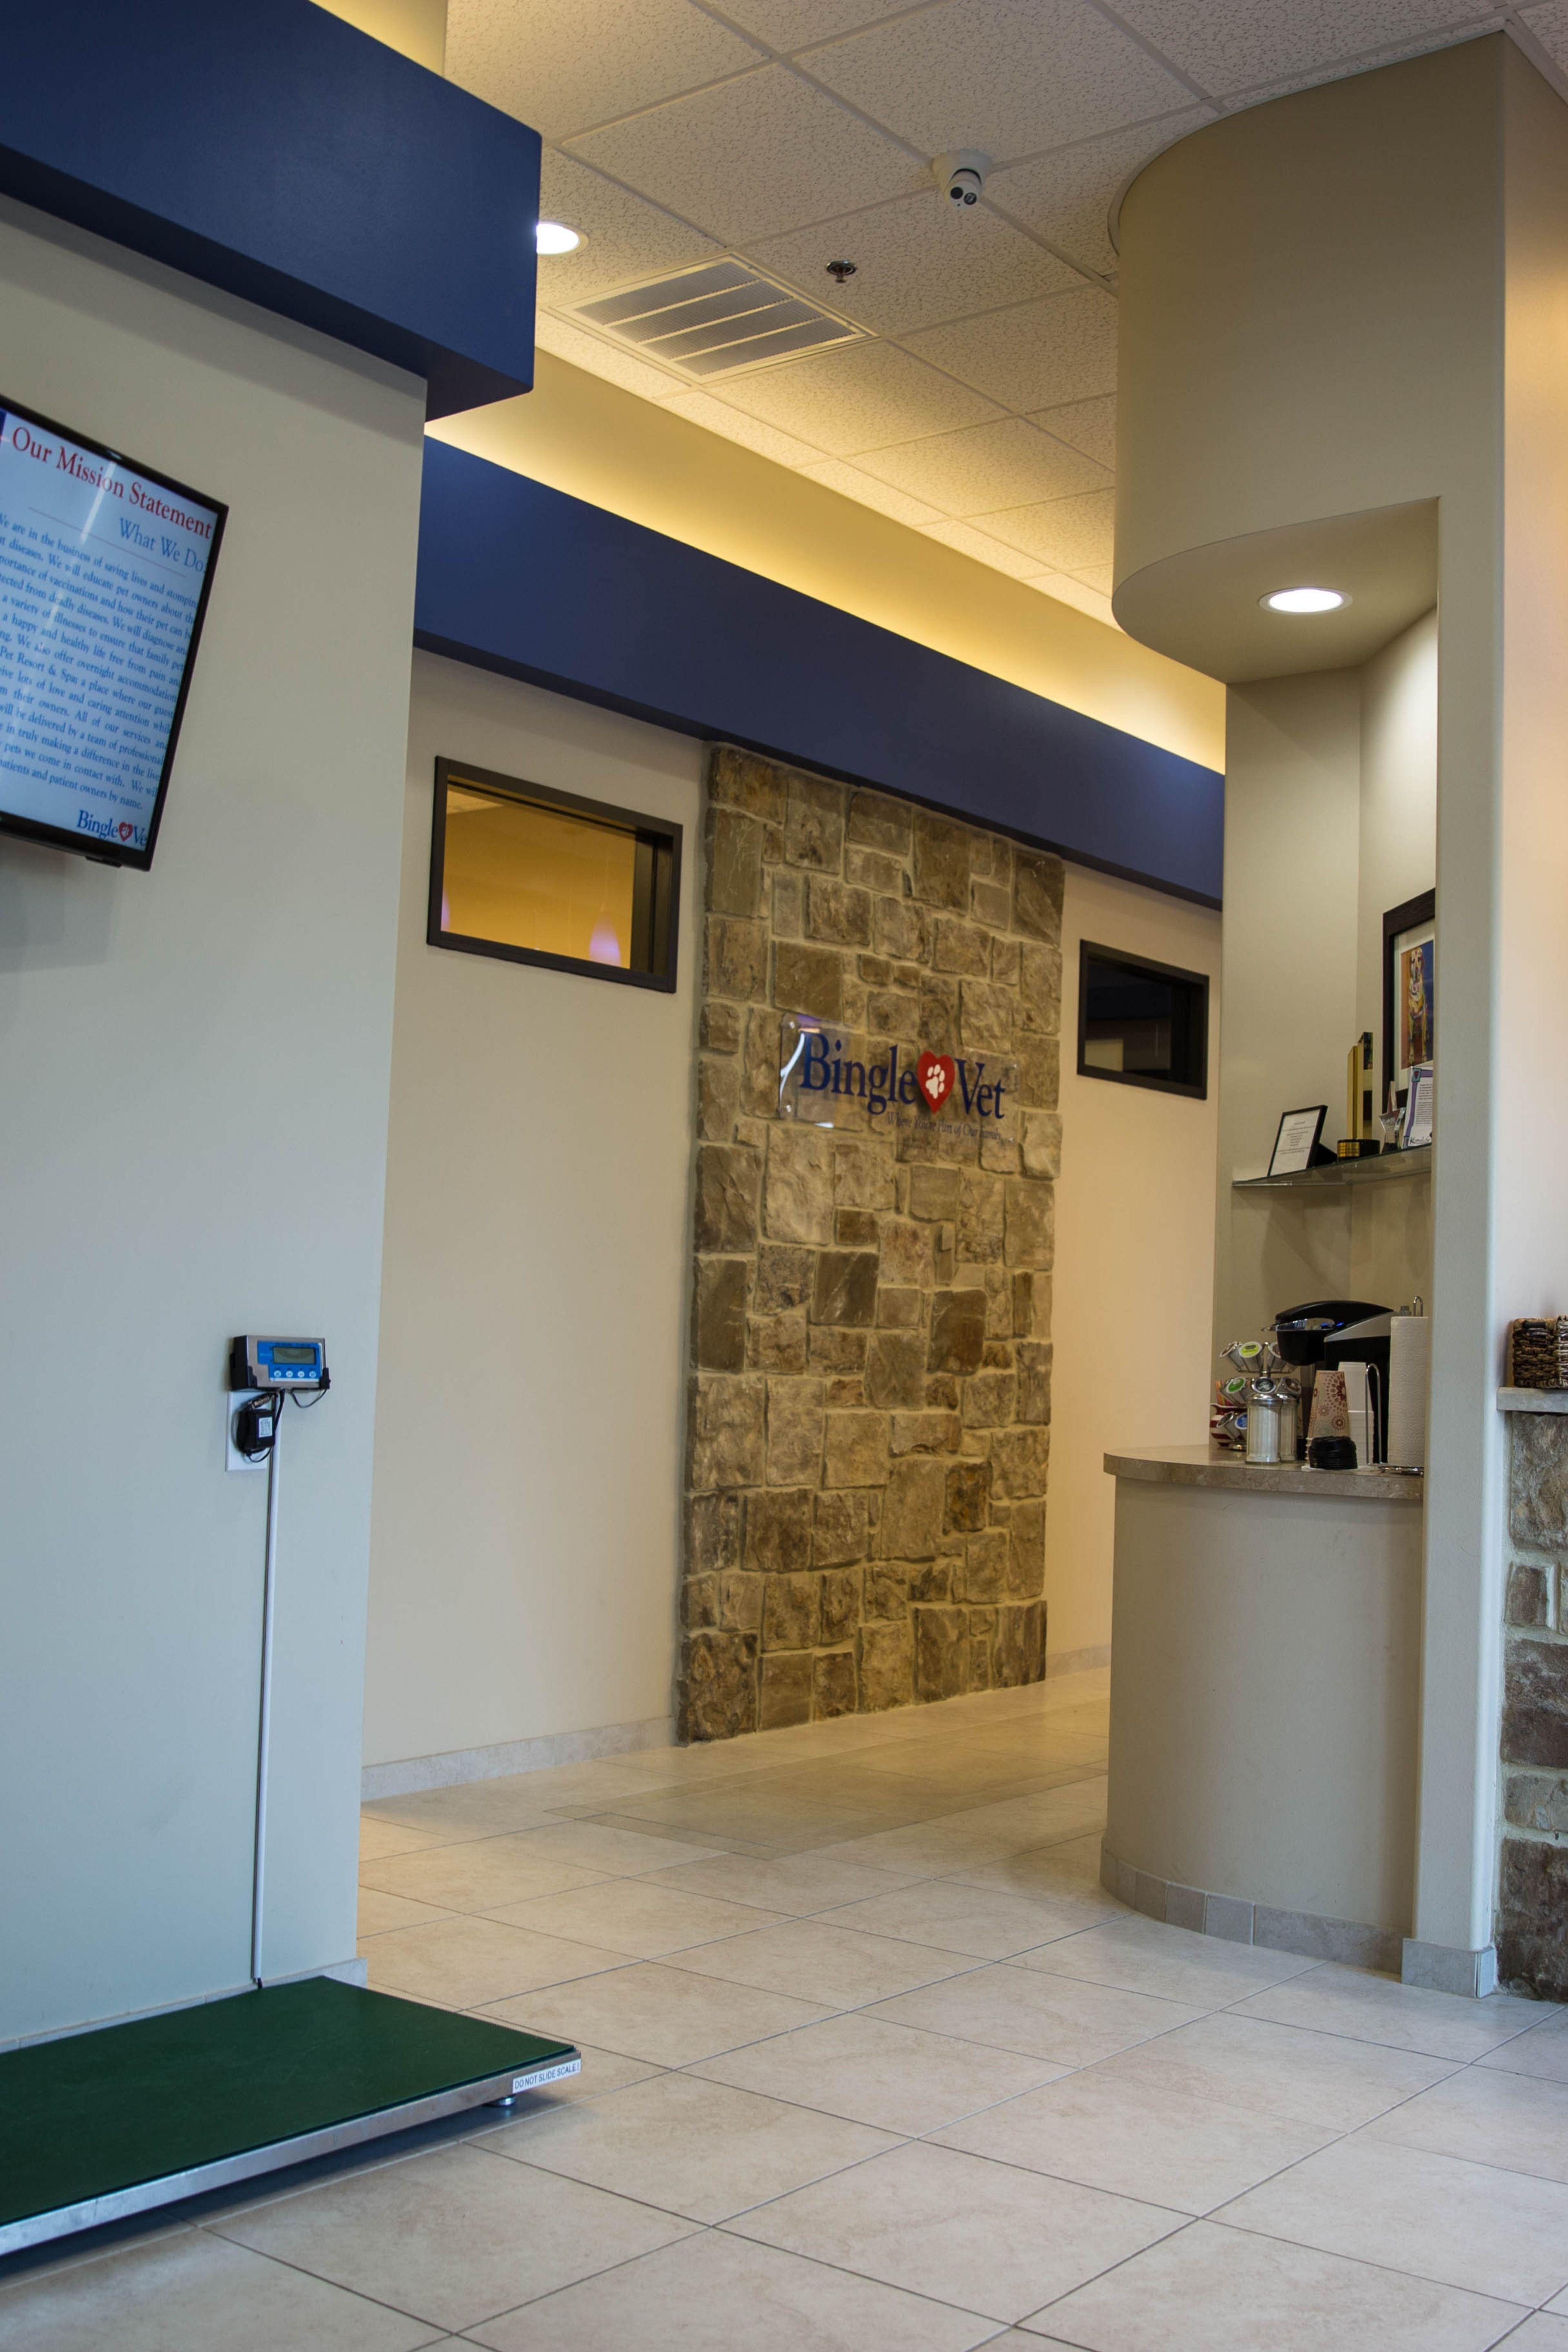 Waiting and Reception Home, Home decor, Decor